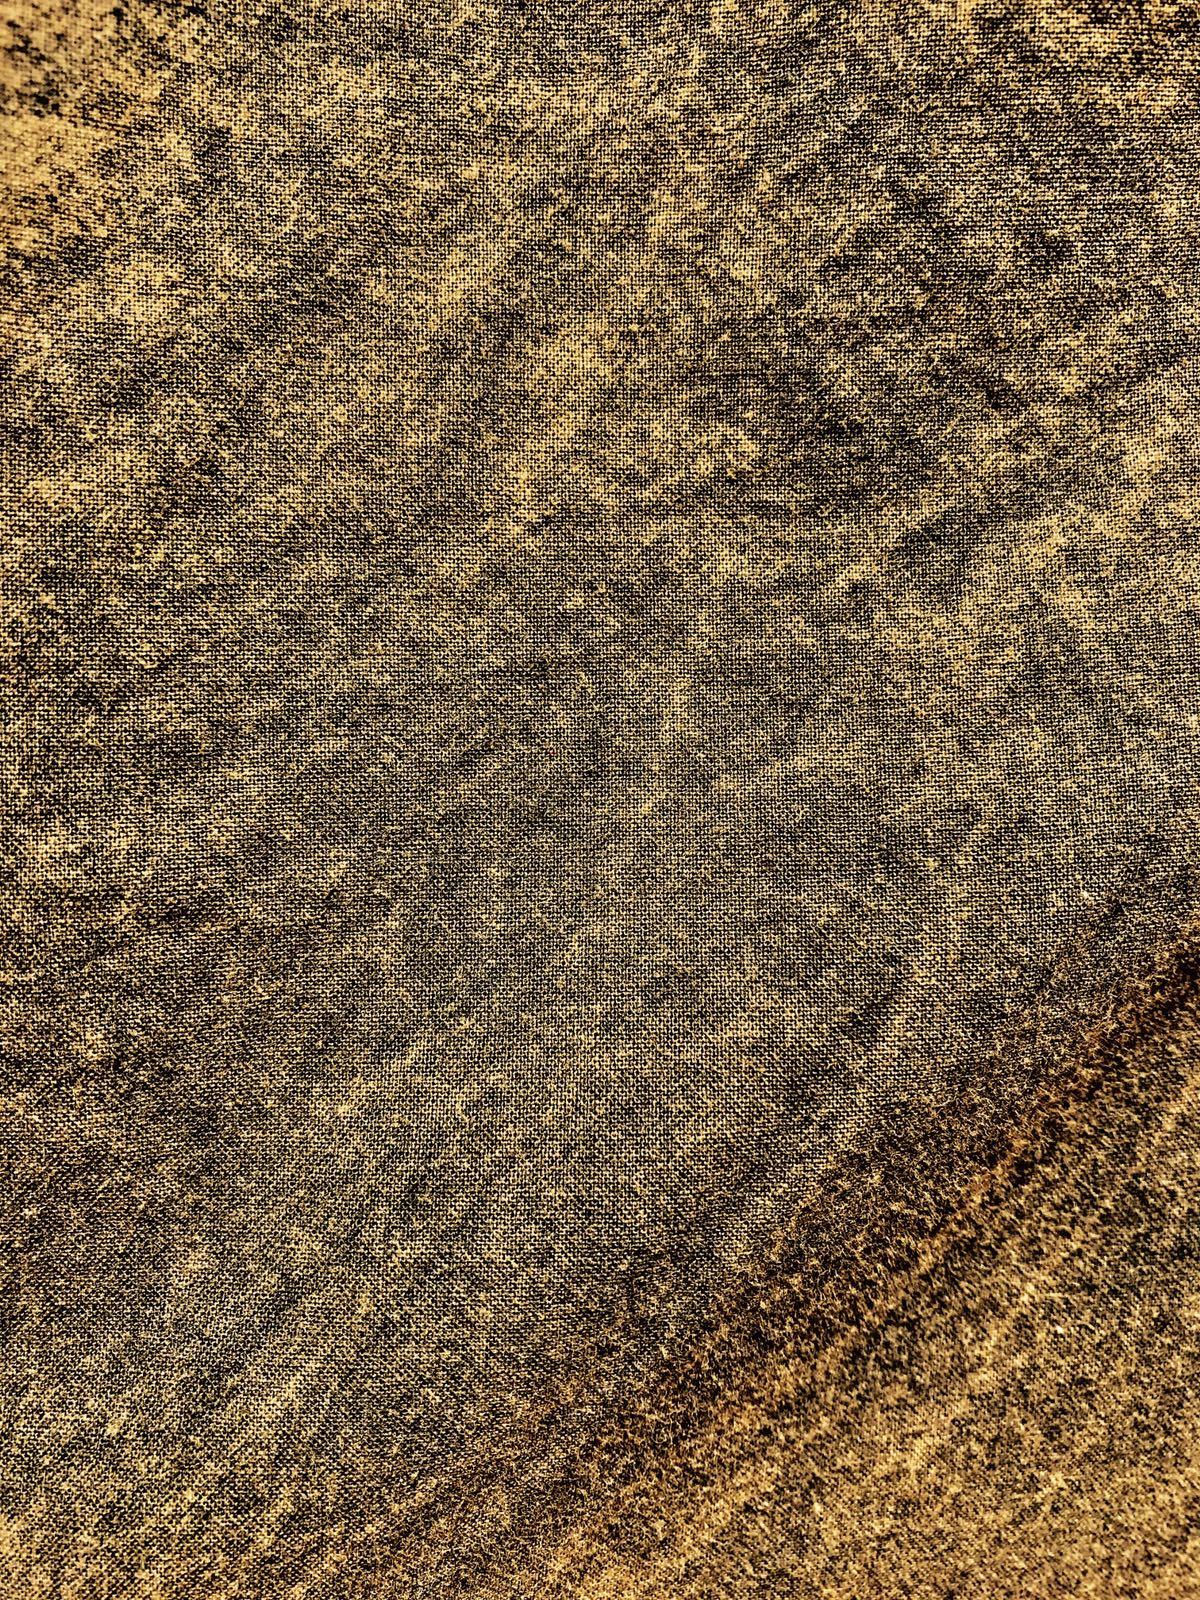 Sand gold